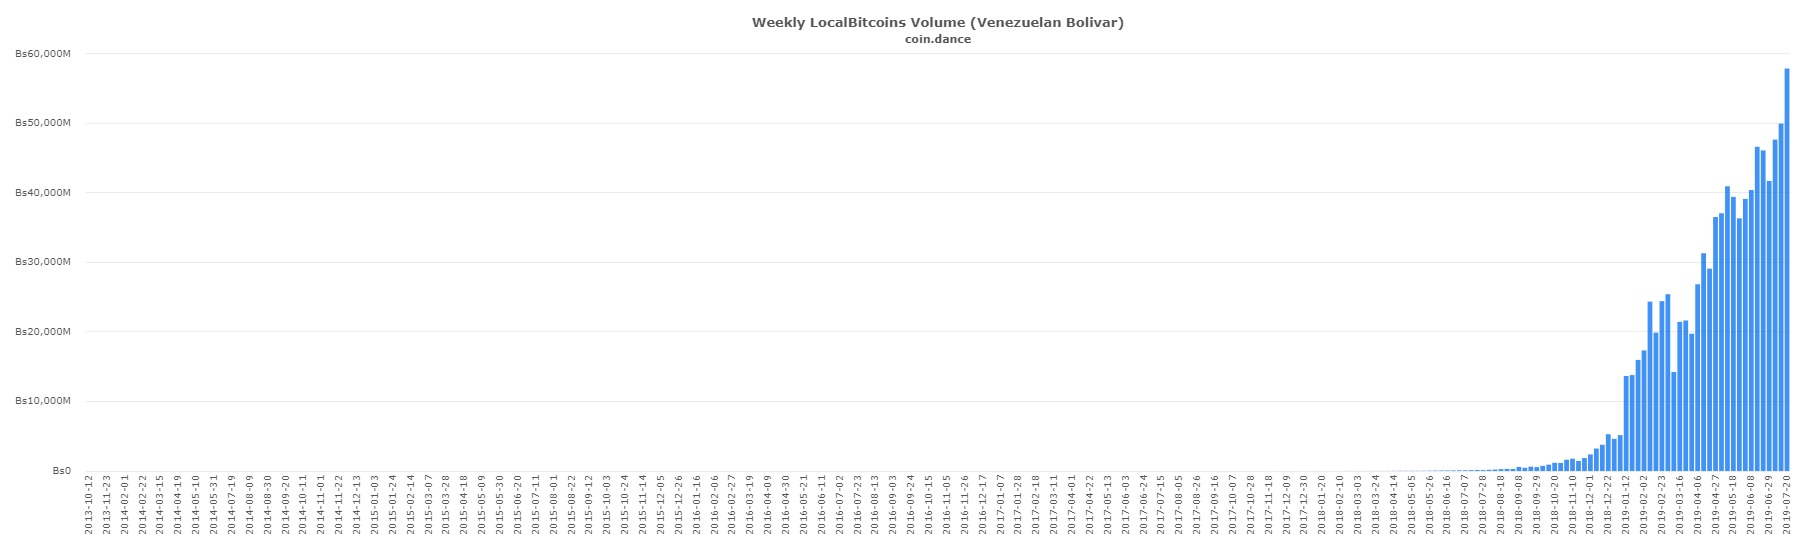 coin-dance-localbitcoins-VES-volume.jpg